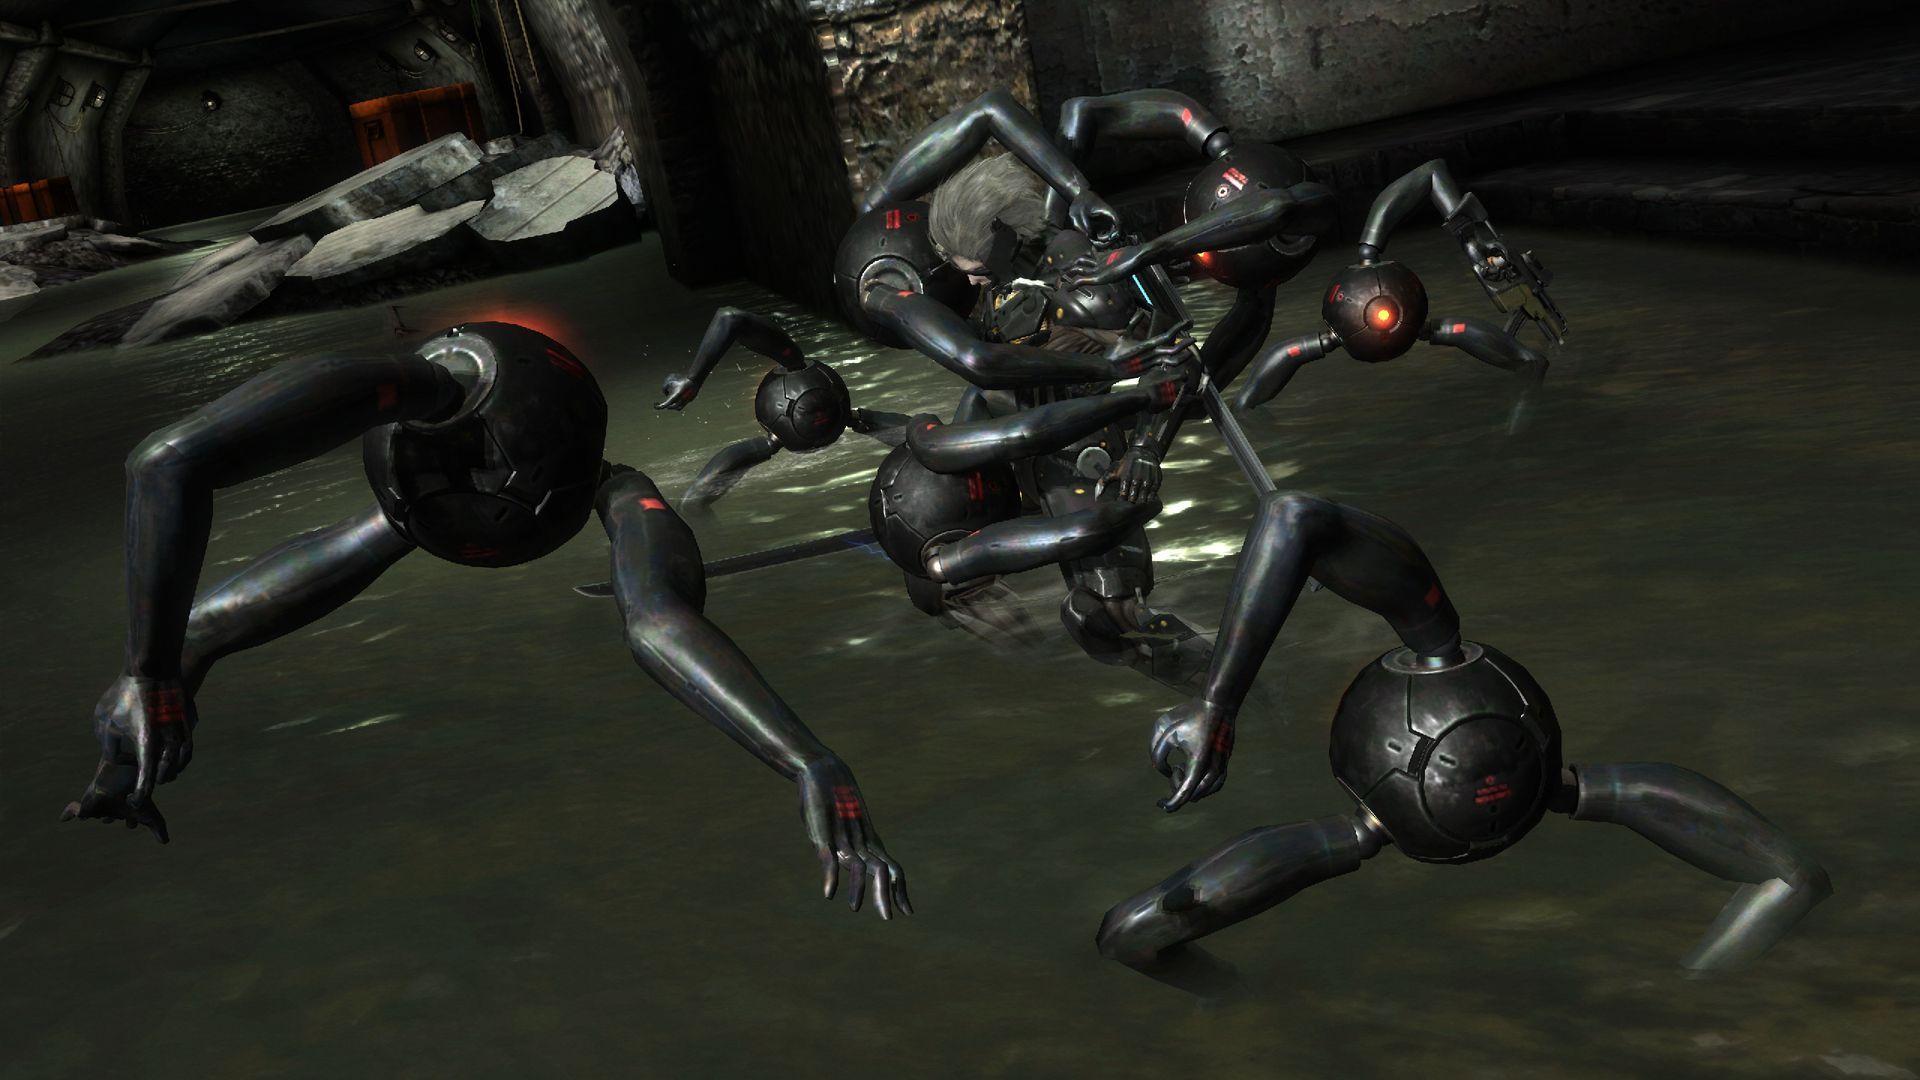 Wallpaper HD Metal Gear Rising Revengeance  #MetalGear #MetalGearRising #Raiden #MetalGearVengeance #Action #Games #Videogames #accion #fight #lucha #MetalGearRevengeance #PlatinumGames #Konami #JacktheRipper